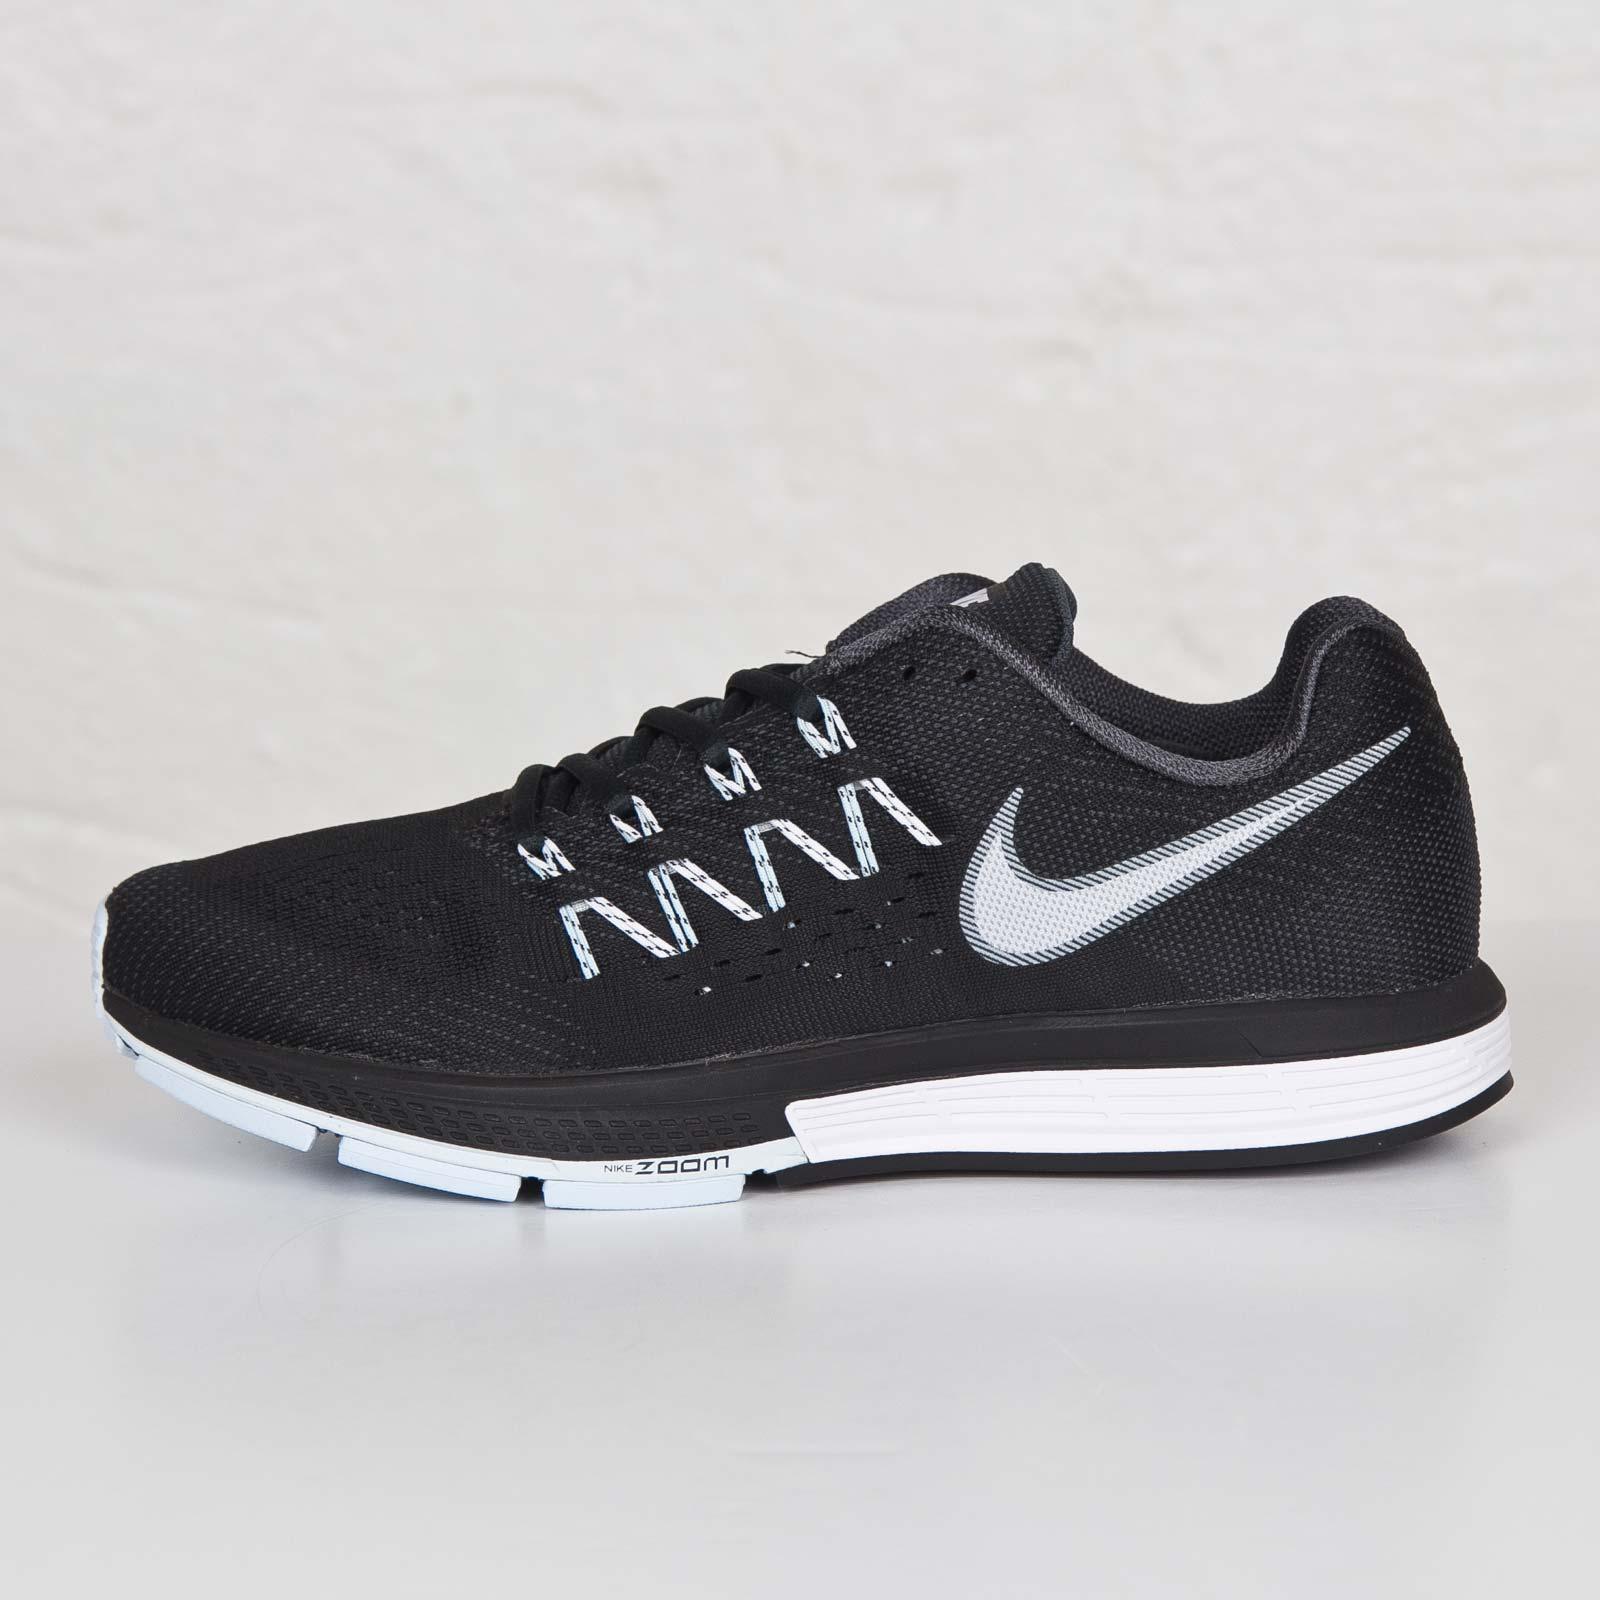 Nike Air Zoom Vomero 10 717440 002 Sneakersnstuff I